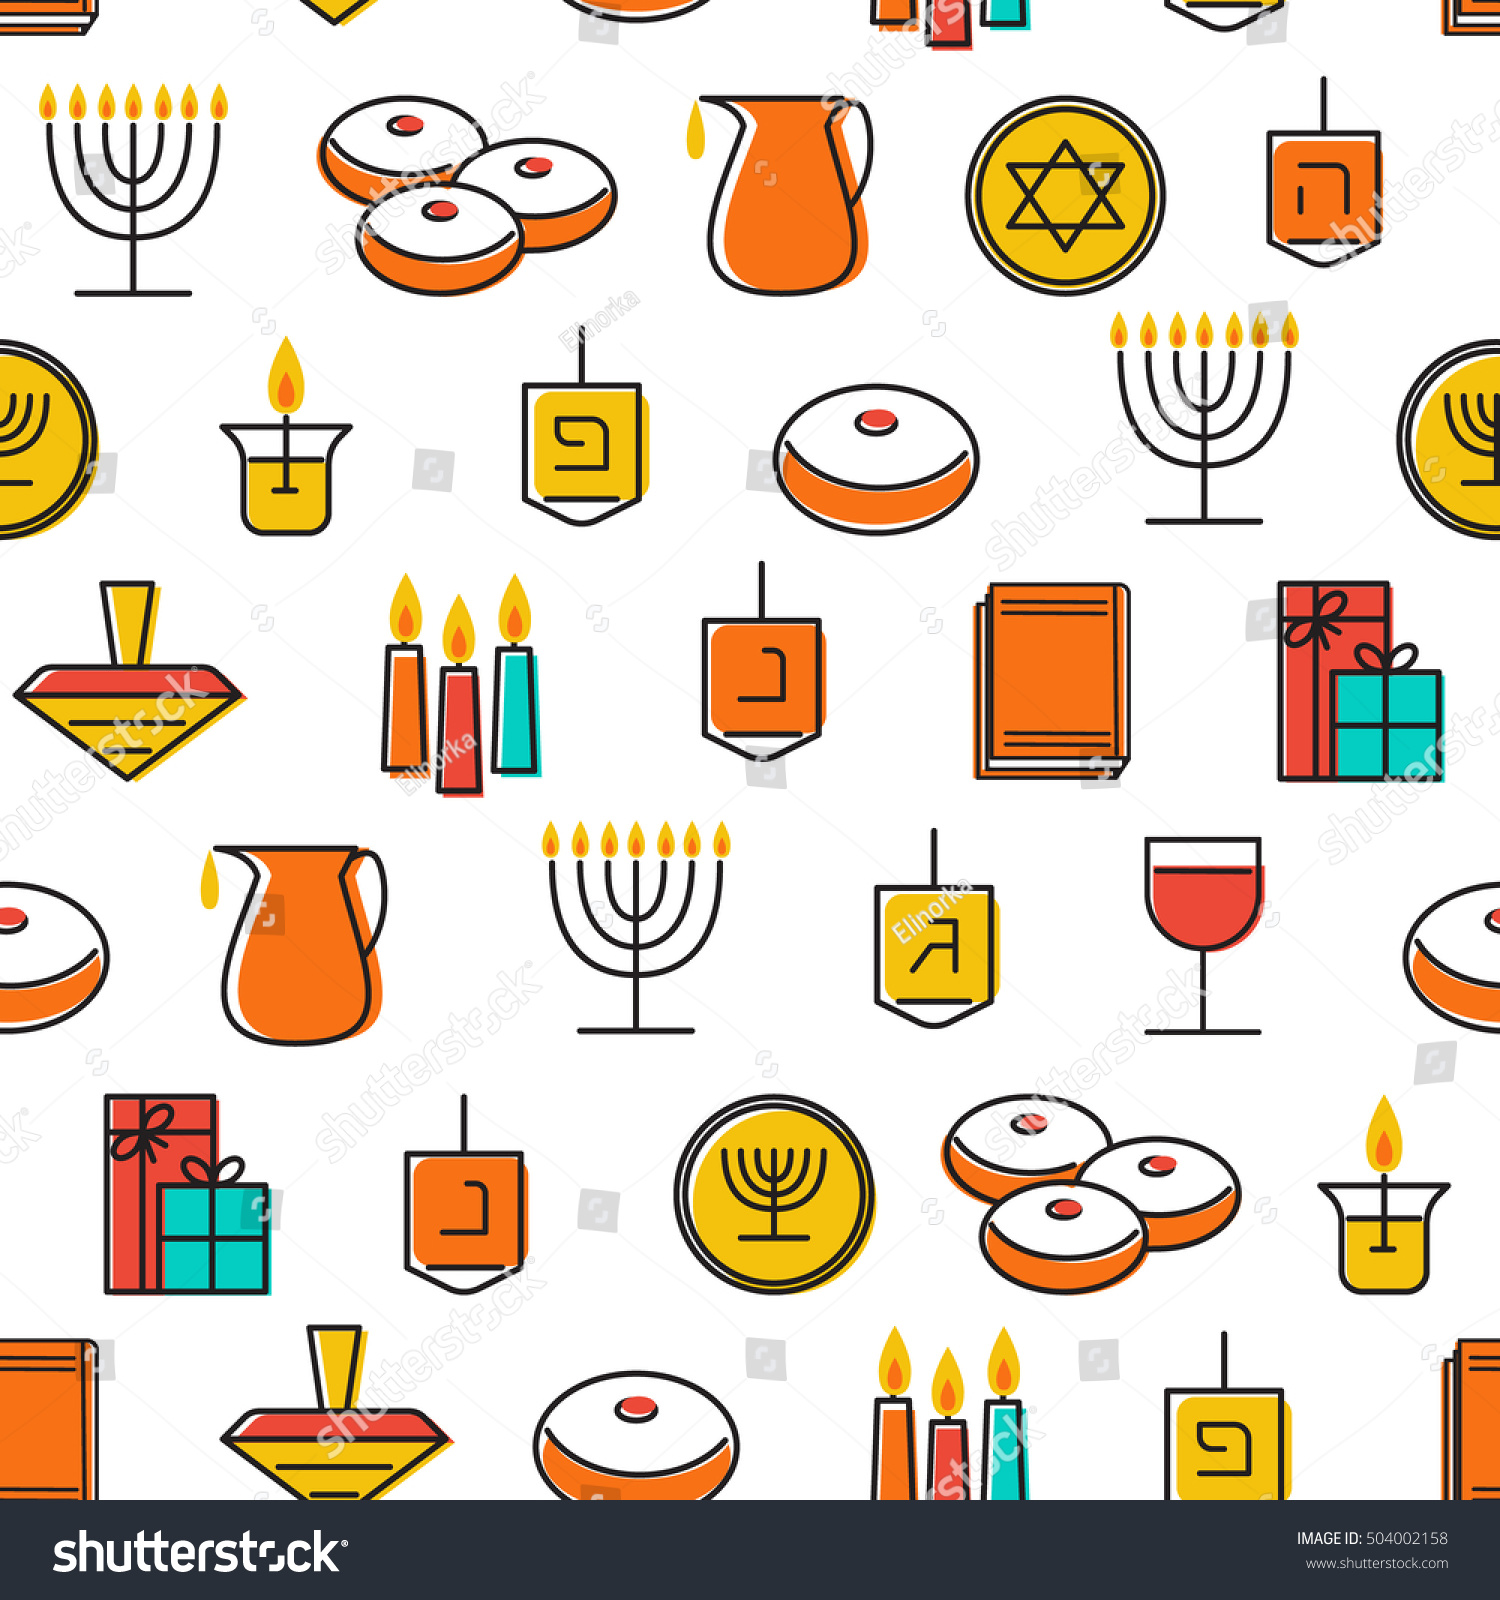 Uncategorized Chanukah Symbols hanukkah seamless pattern symbols stock vector candles menorah and donuts illustration